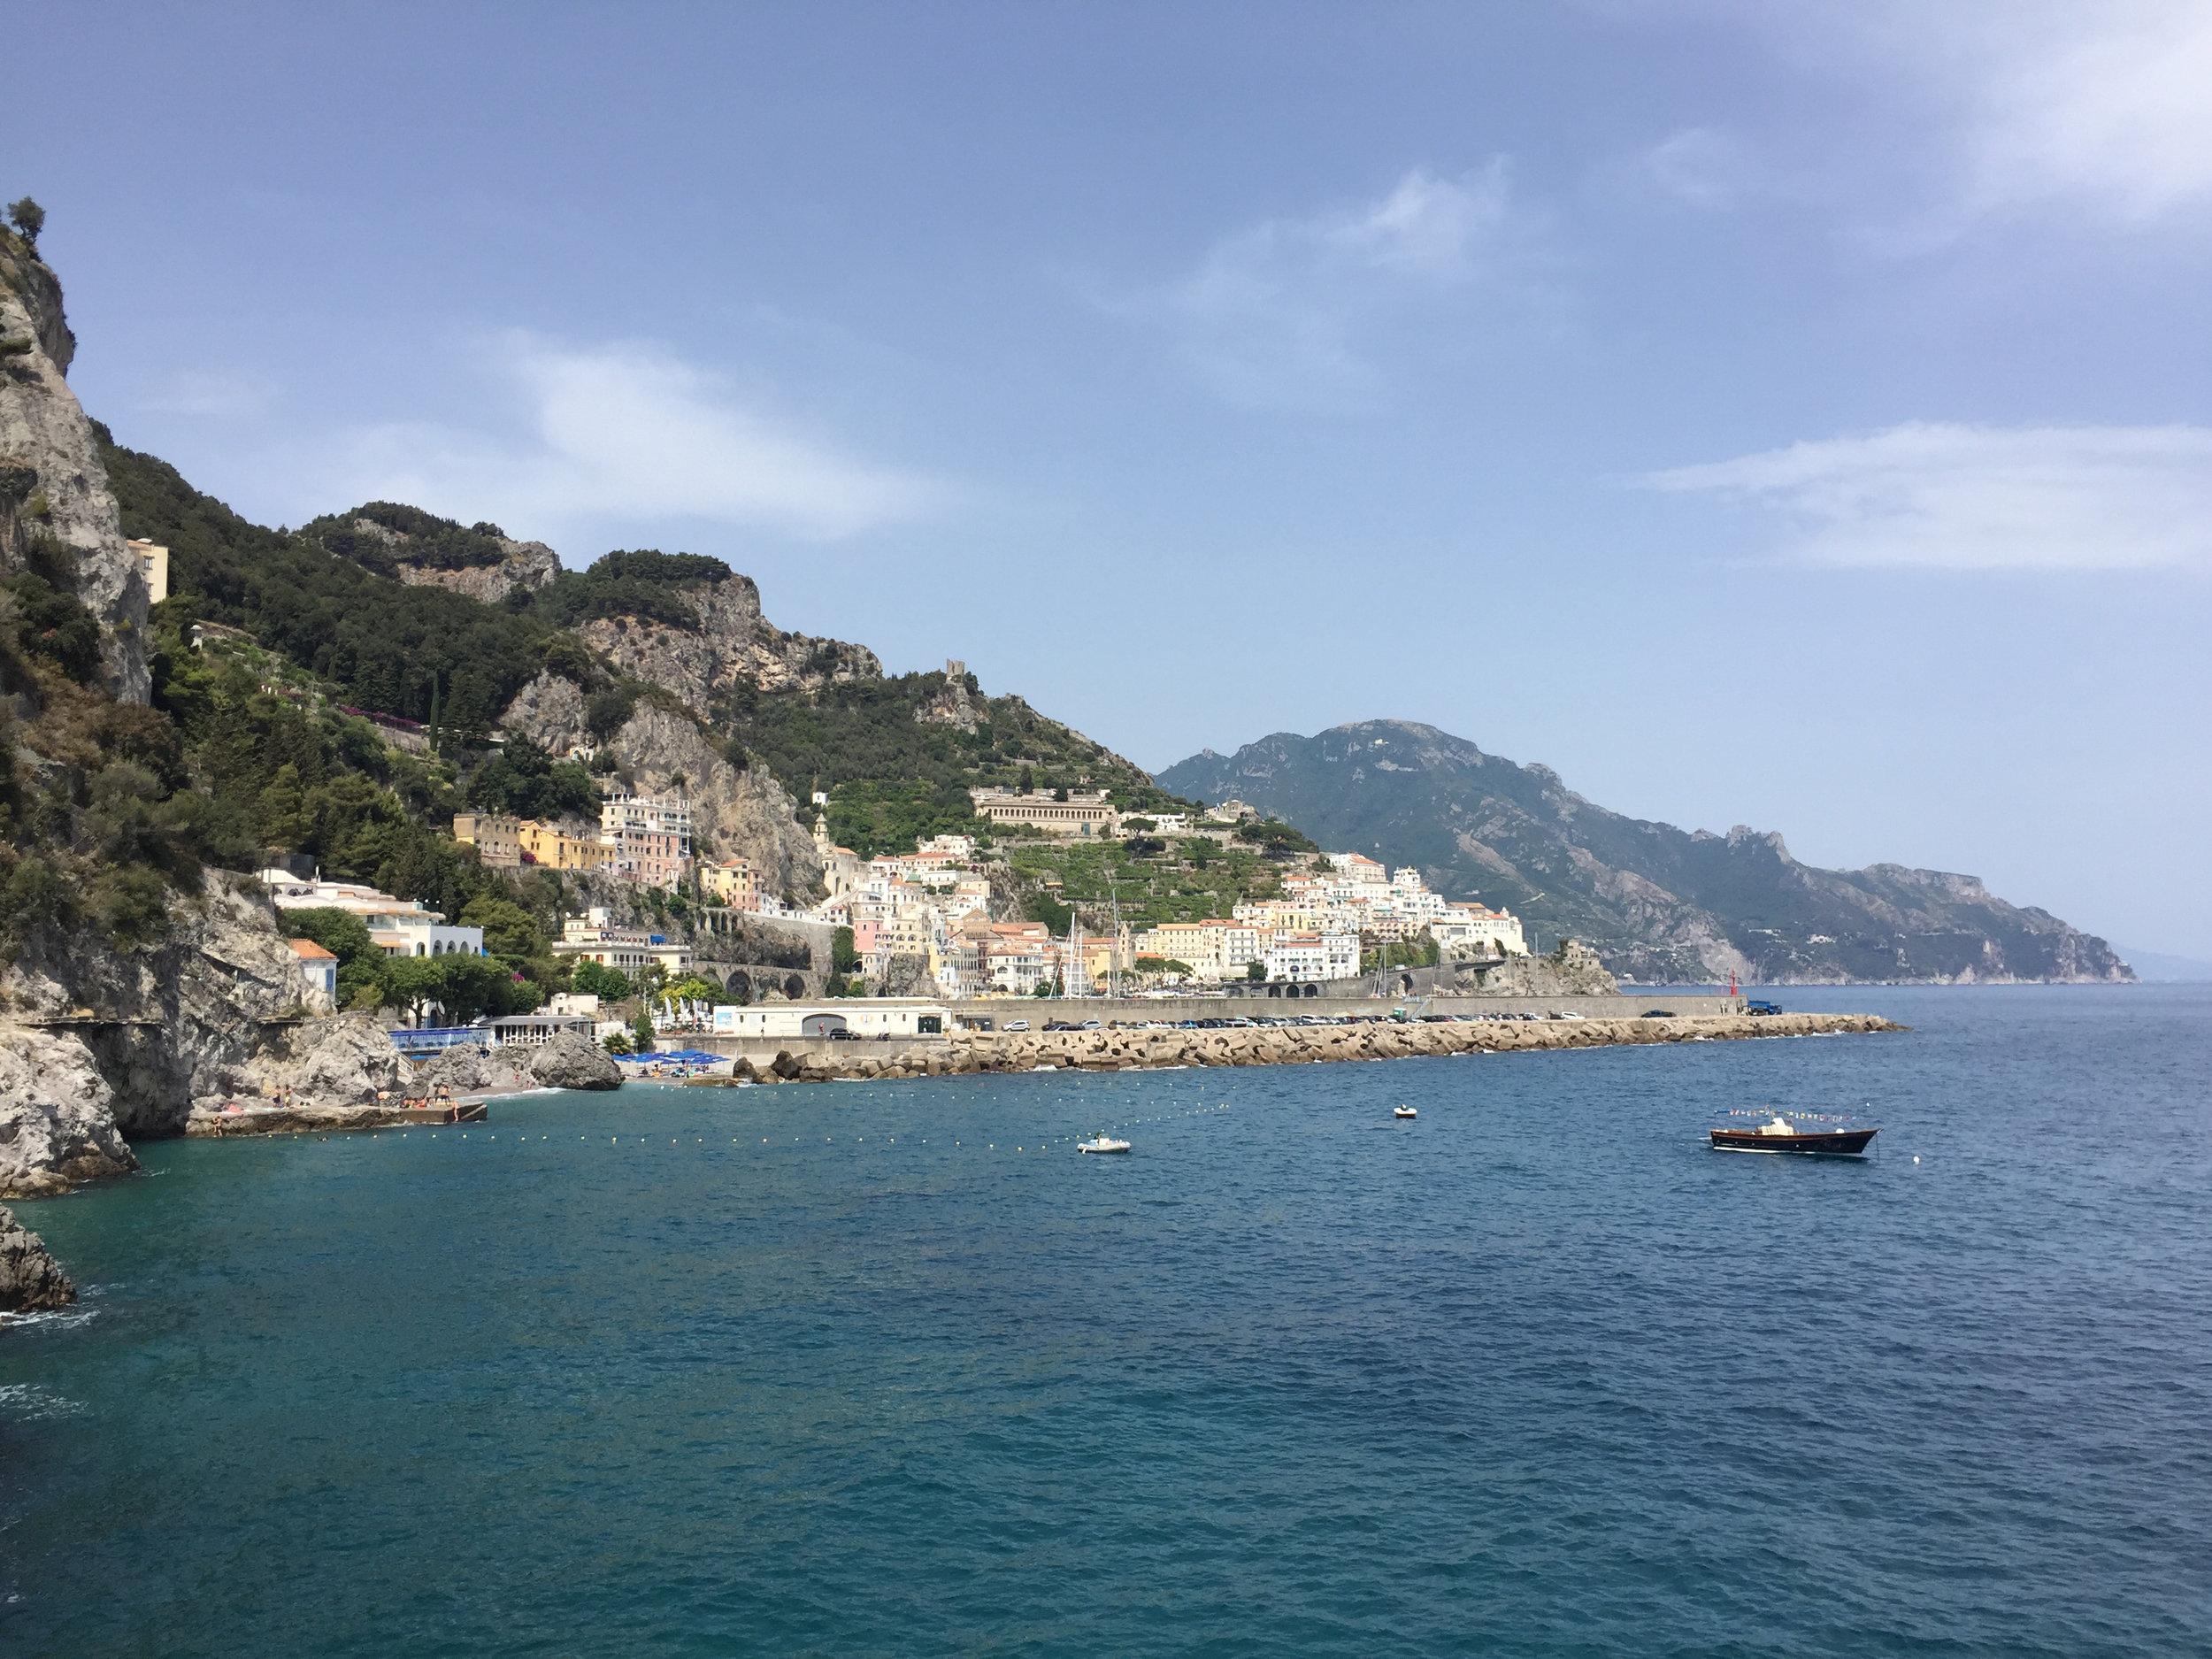 View on the amalfi coast